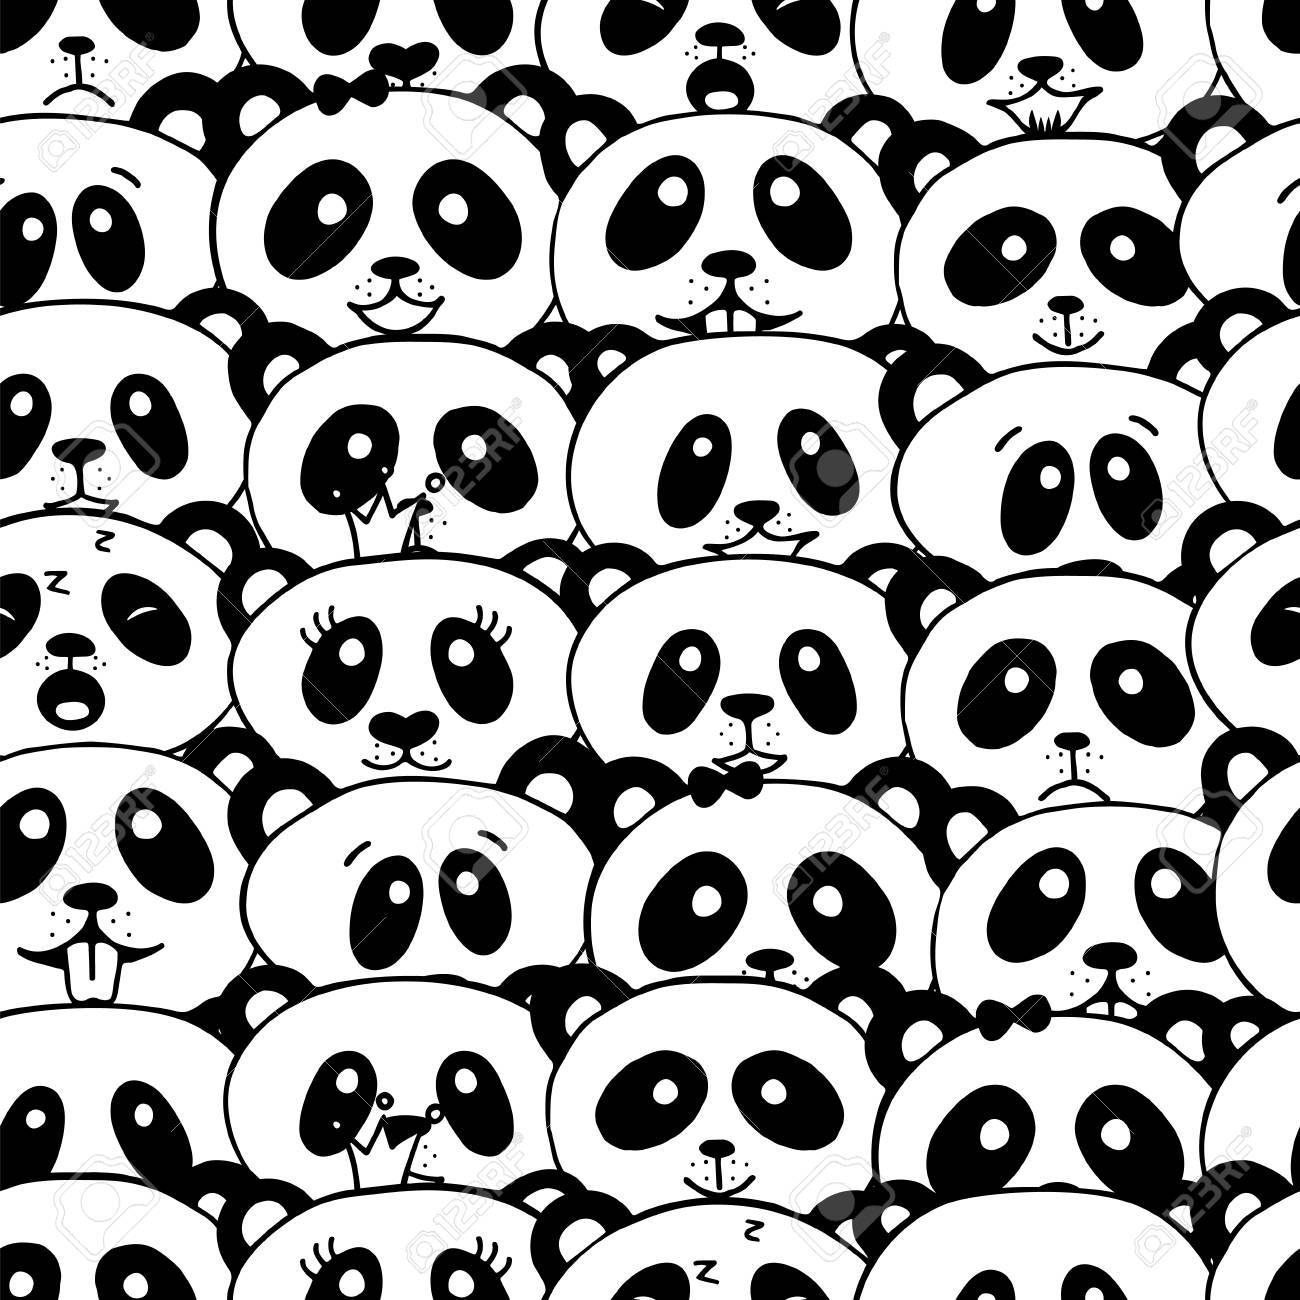 Patrón Sin Costuras Con Panda. Linda Panda Cara Fondo De Pantalla De ...